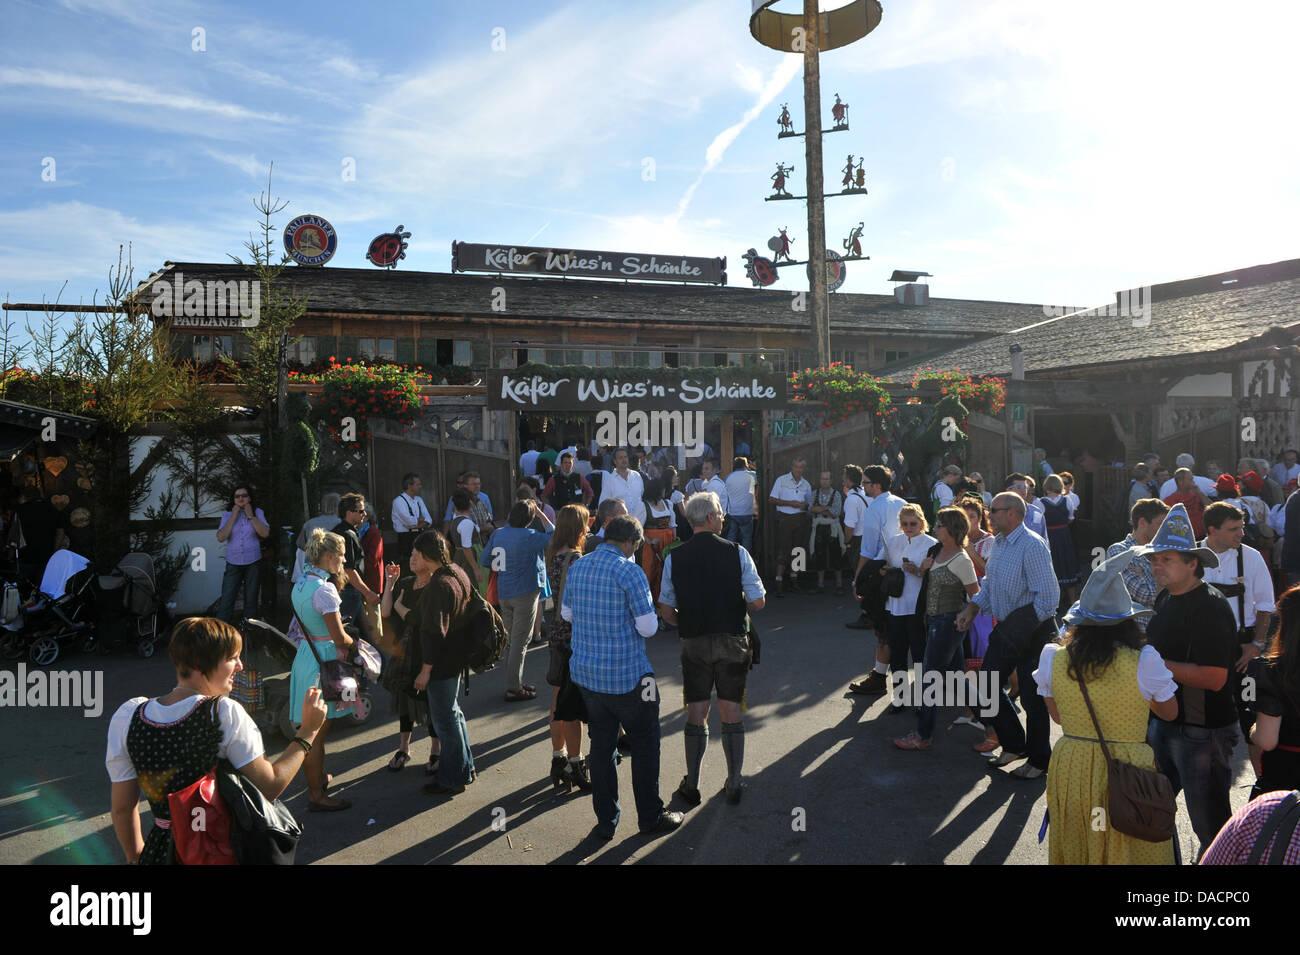 The Kaefer\'s Wies\'n-Schaenke tent on the Oktoberfest grounds is ...